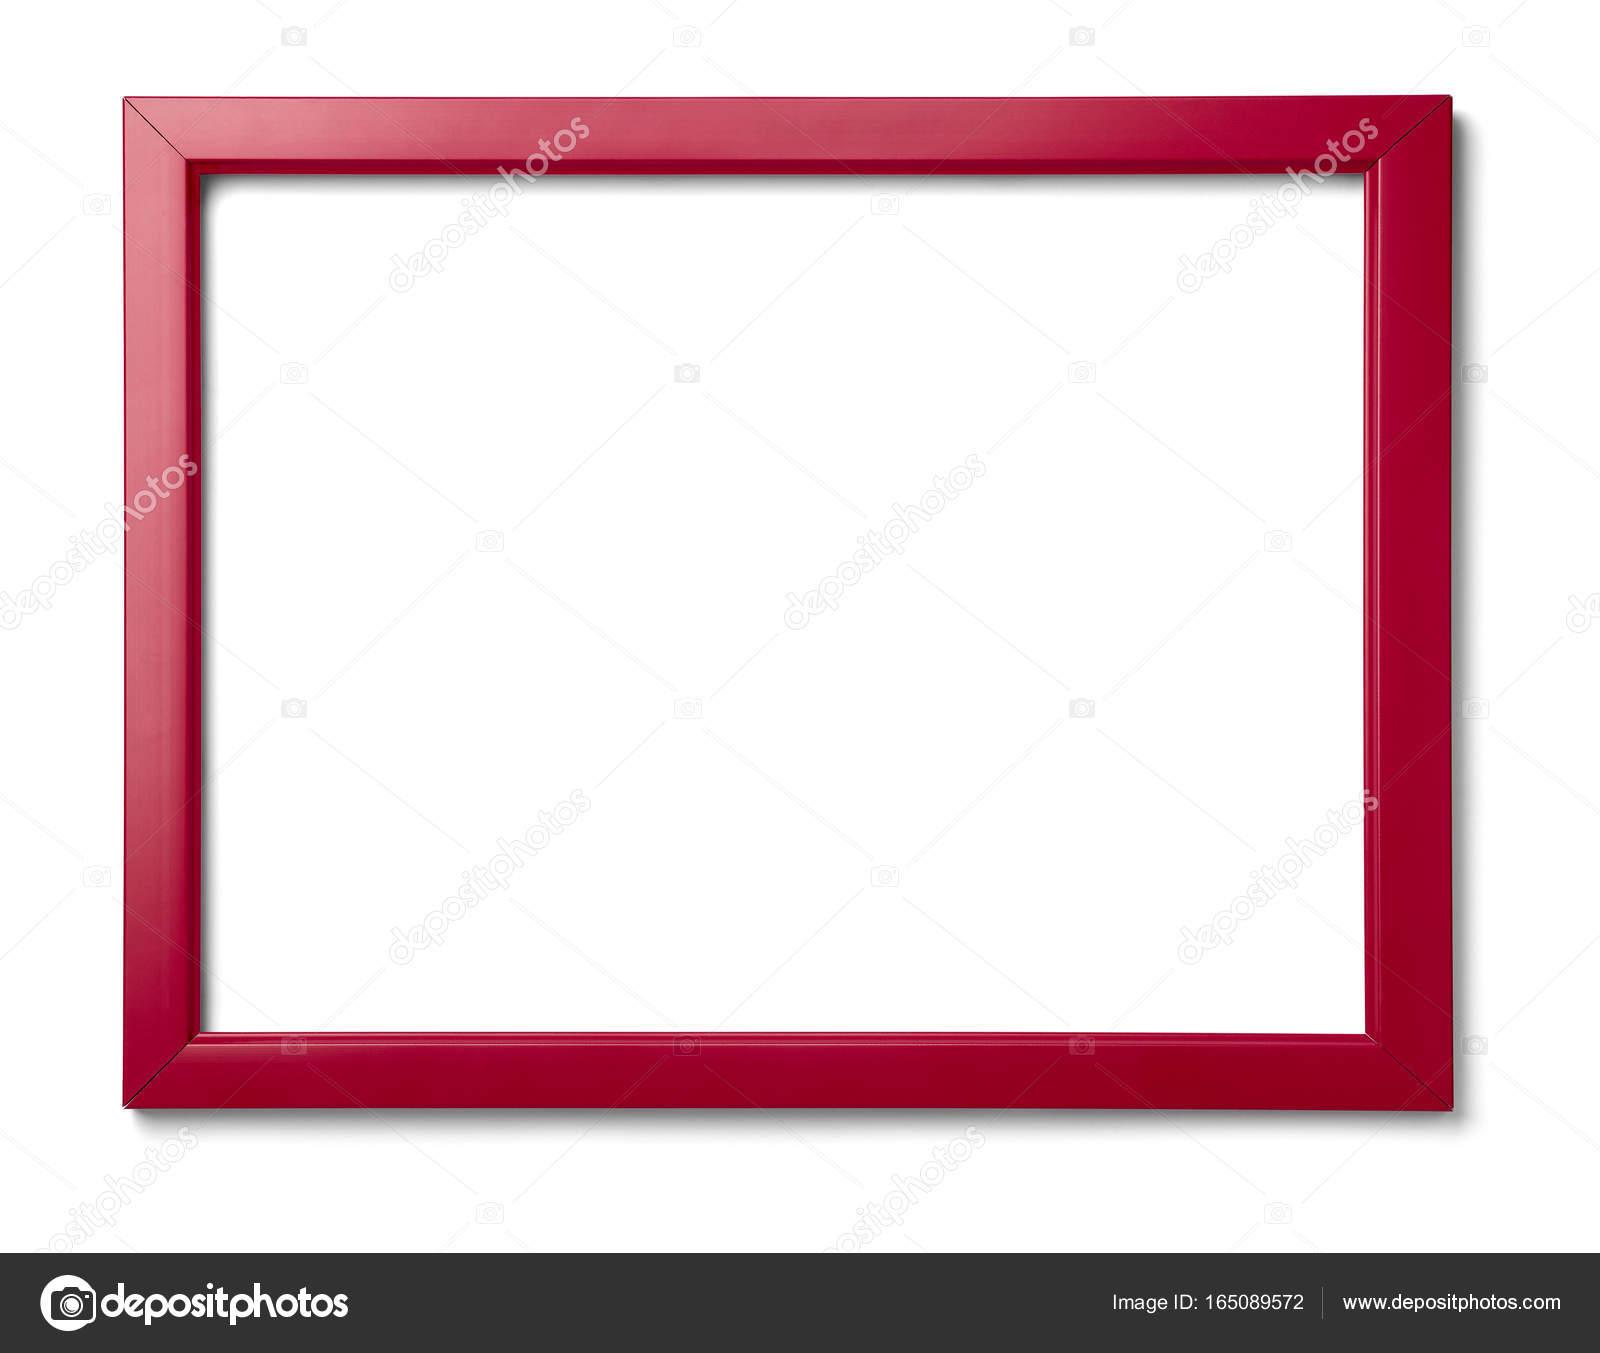 Vintage-Rahmen Holz Hintergrundbild — Stockfoto © PicsFive #165089572